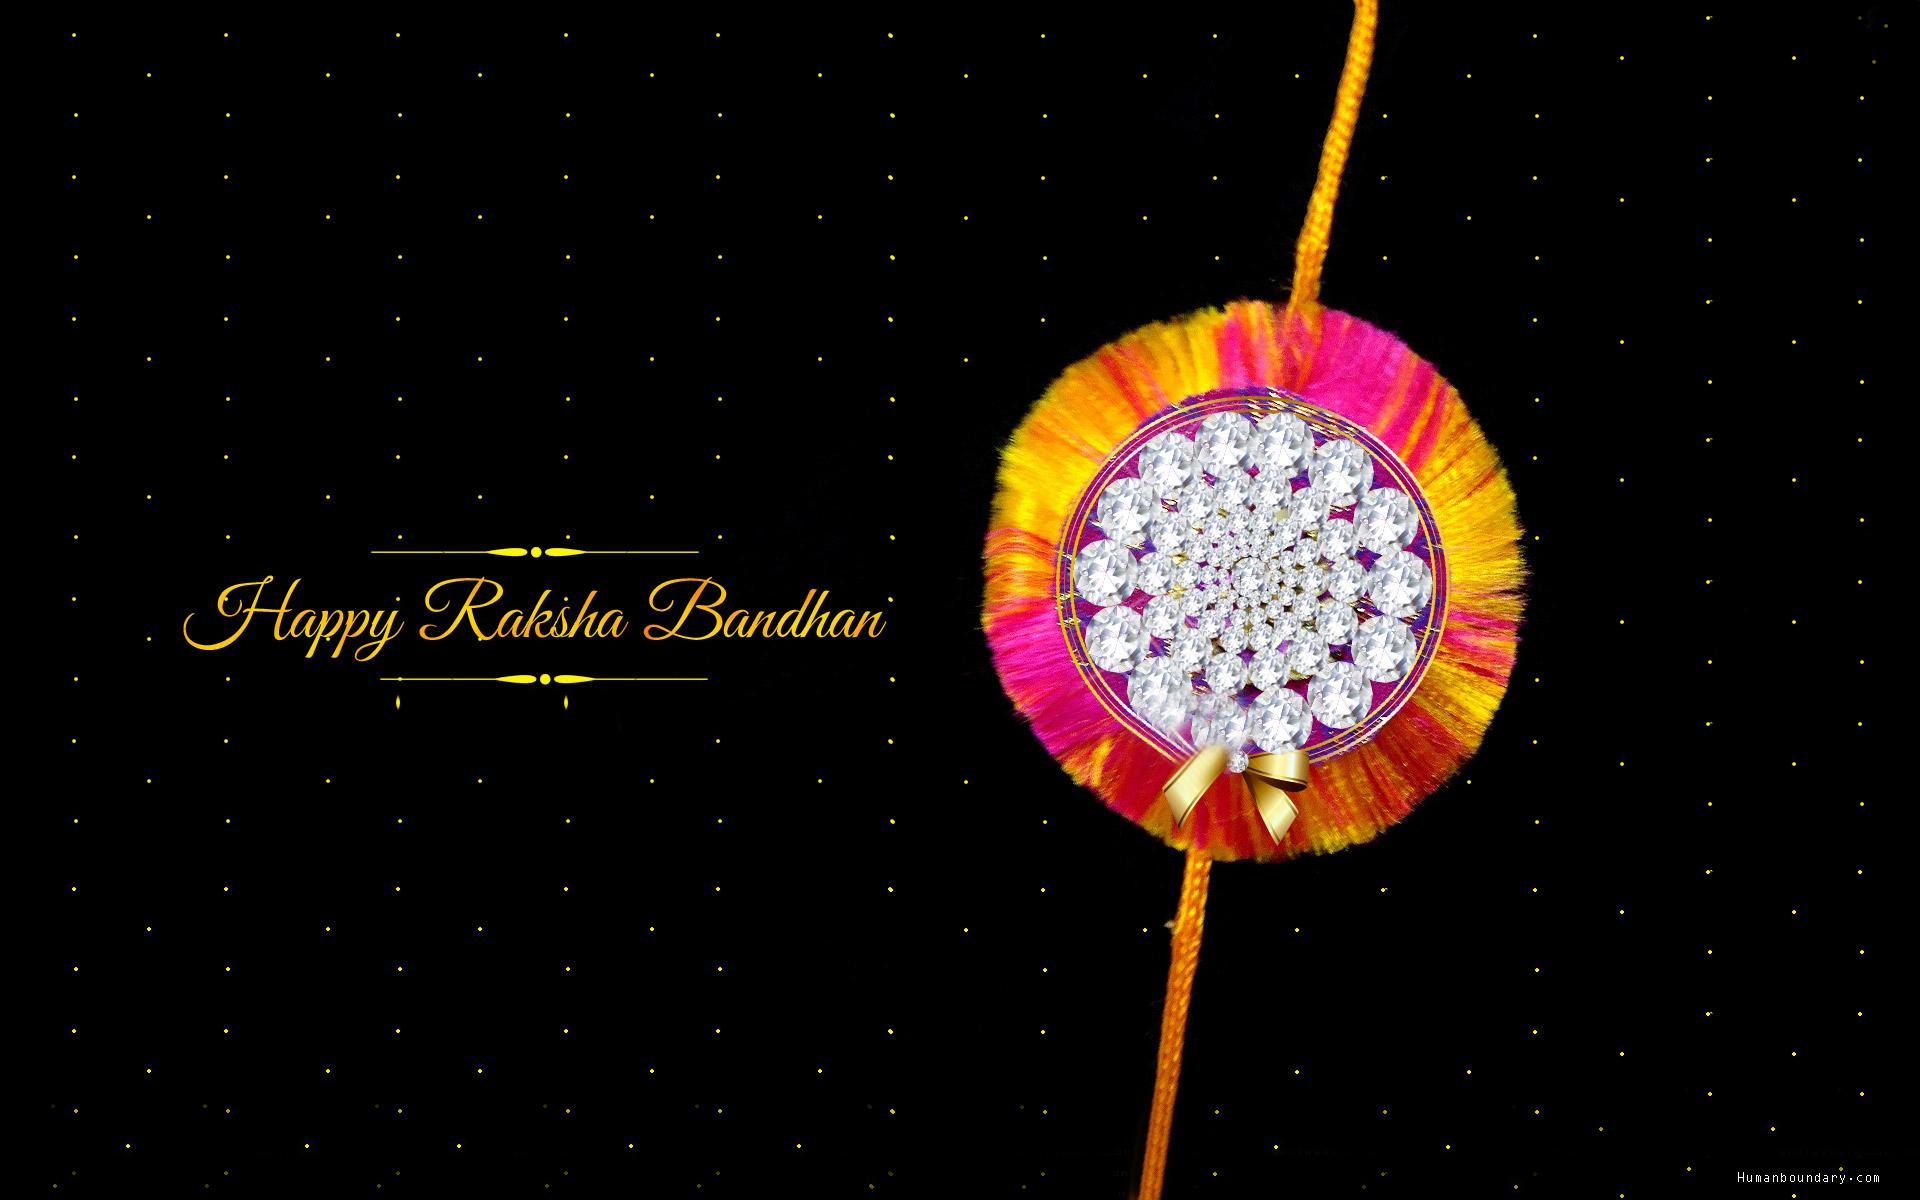 Happy Raksha Bandhan HD Pics & Photos Free Download